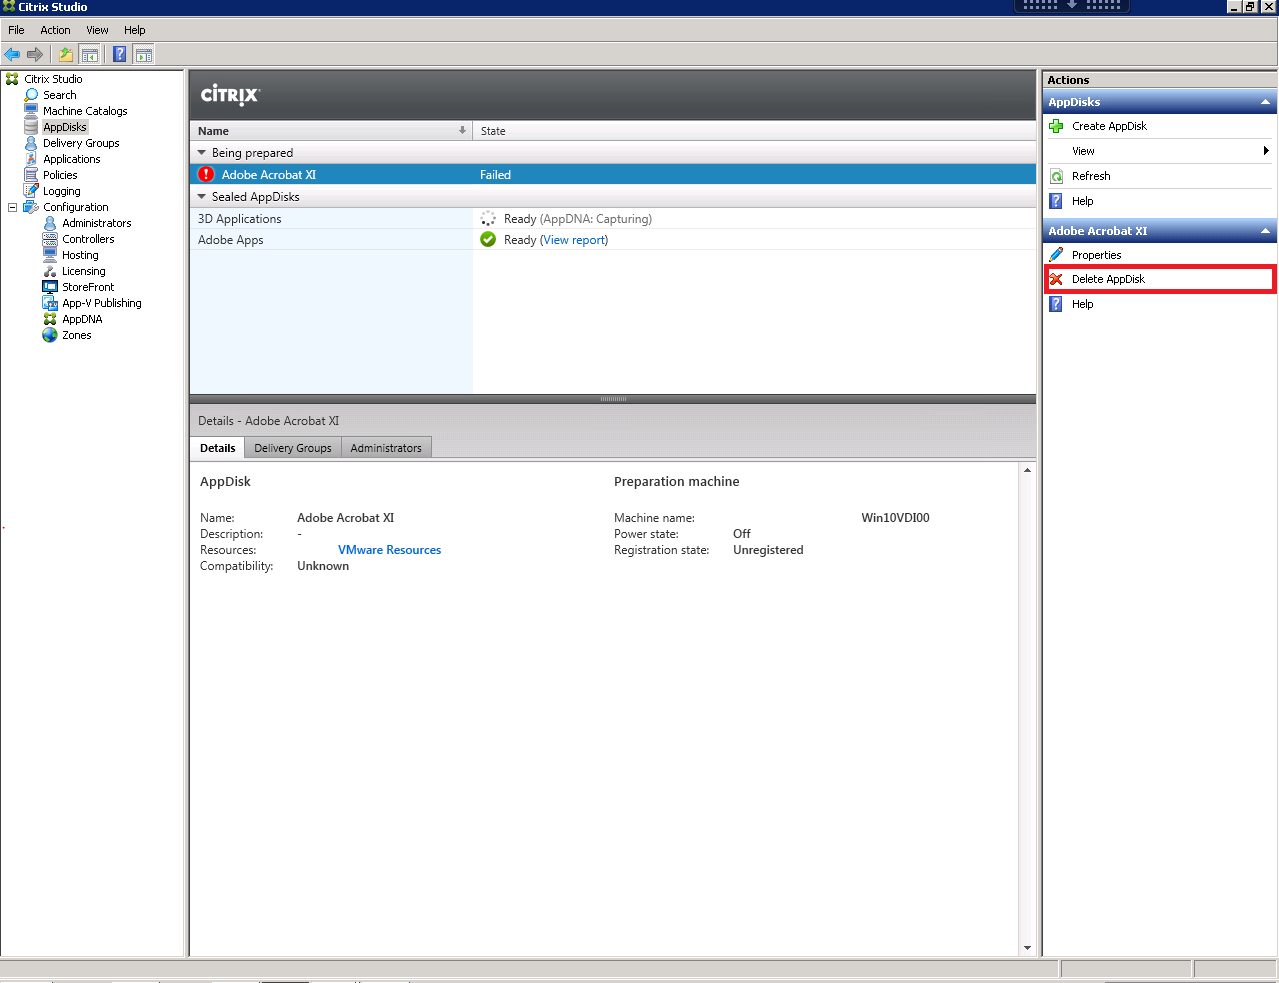 Citrix XenDesktop 7.8 AppDisk Delete AppDisk Console Button